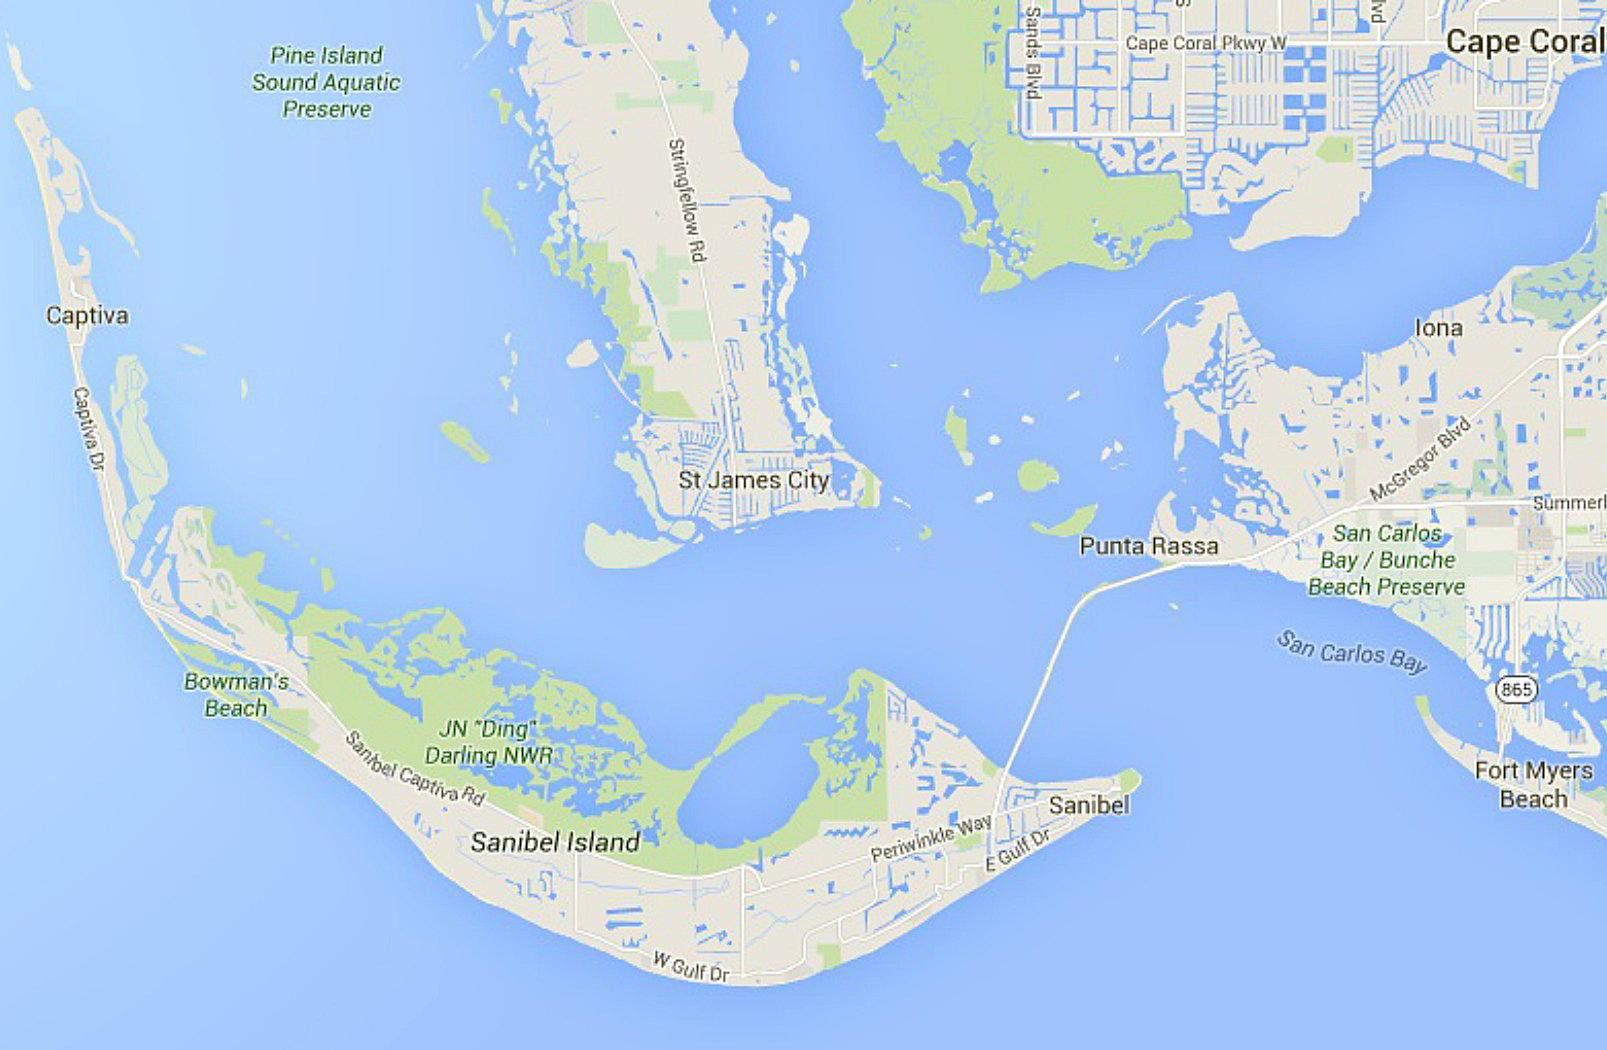 Maps Of Florida: Orlando, Tampa, Miami, Keys, And More - Map Of Florida Gulf Coast Hotels